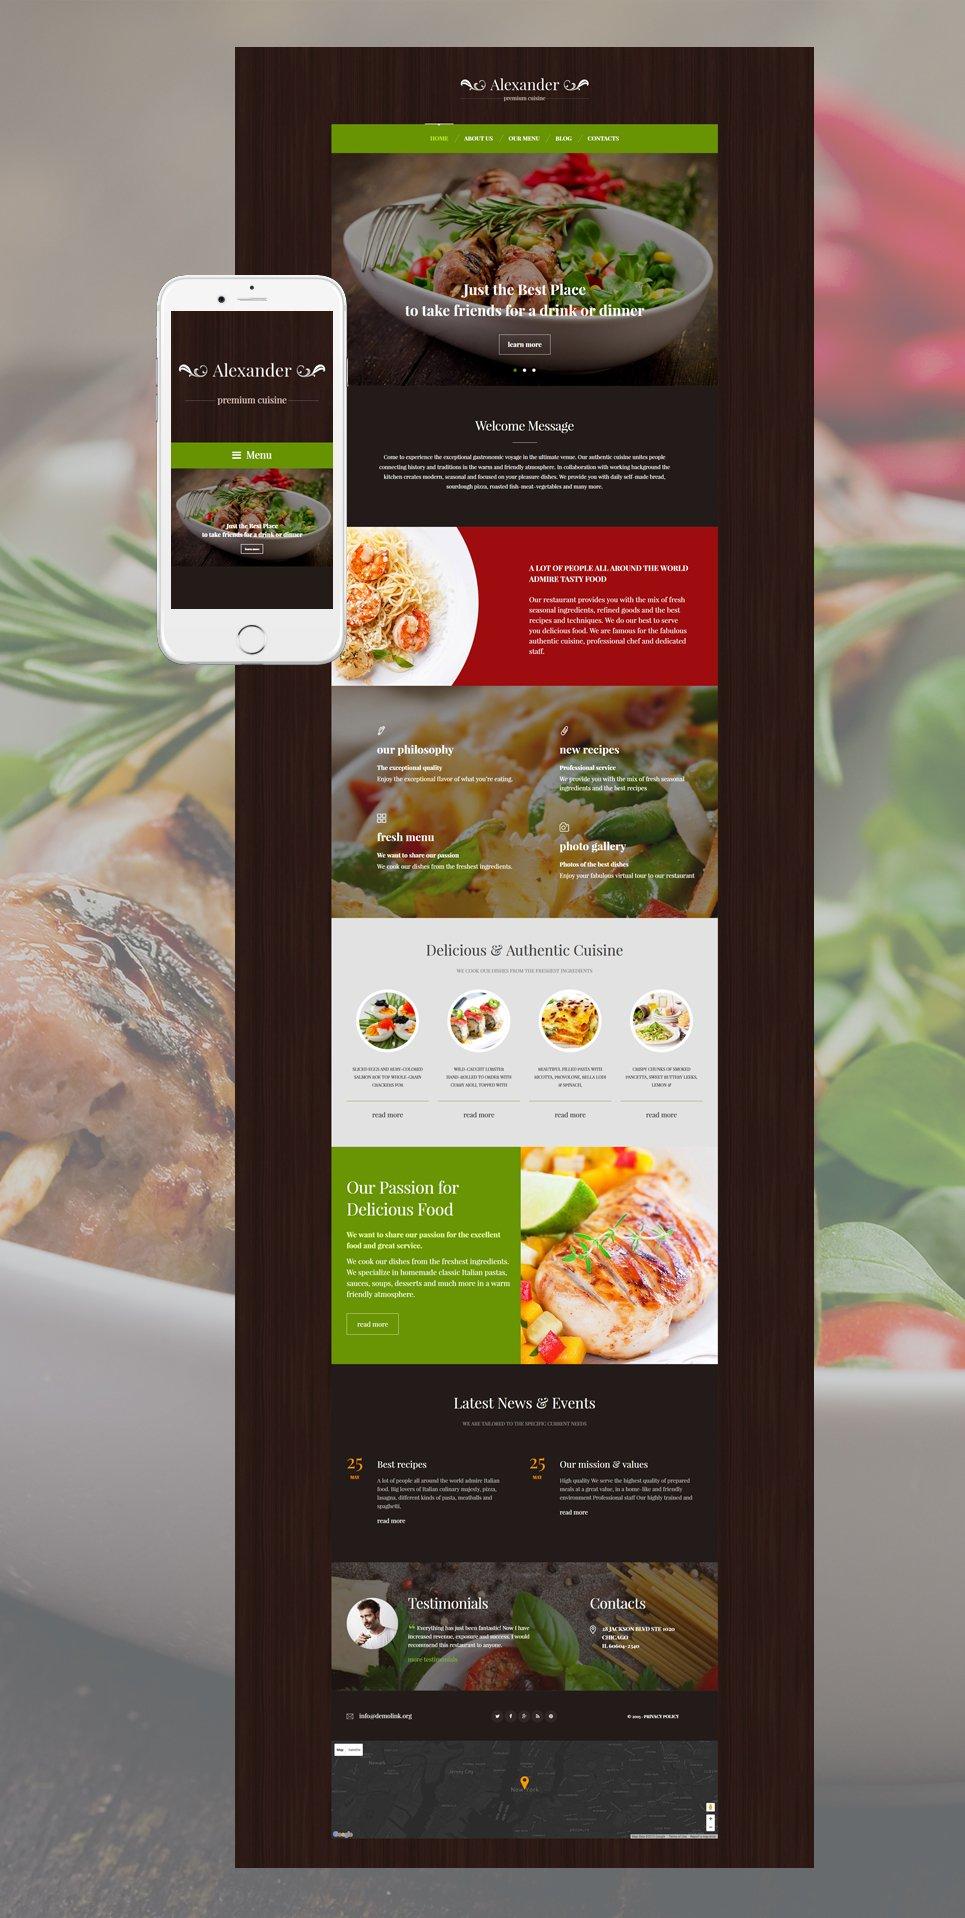 Адаптивный шаблон сайта на тему кафе и ресторан #55761